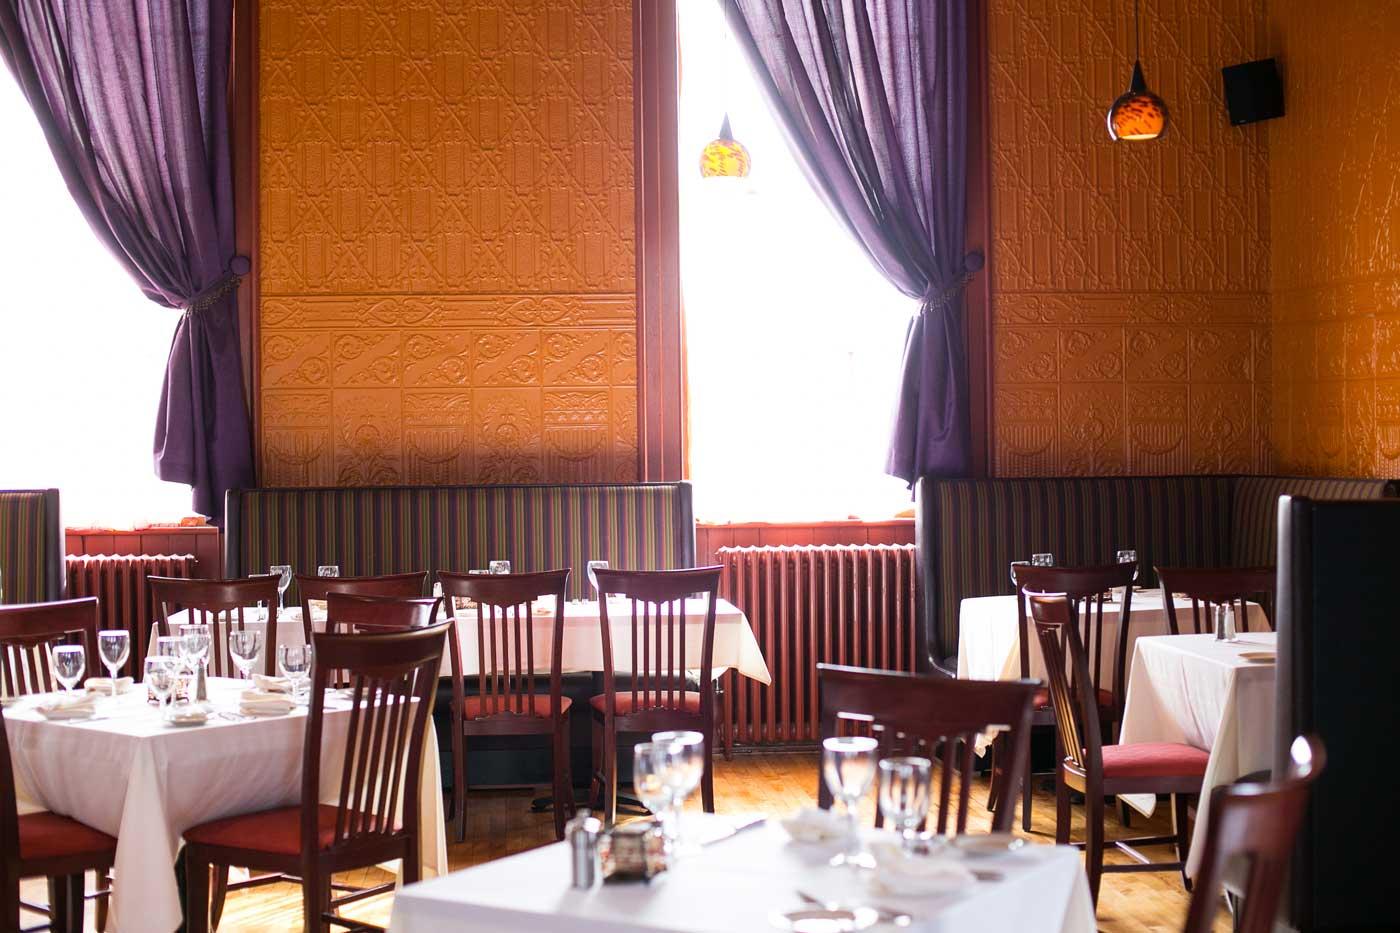 Blue Heron Restaurant Catering Fine Dining Near Northampton And Amherst Ma Blue Heron Restaurant Sunderland Massachusetts